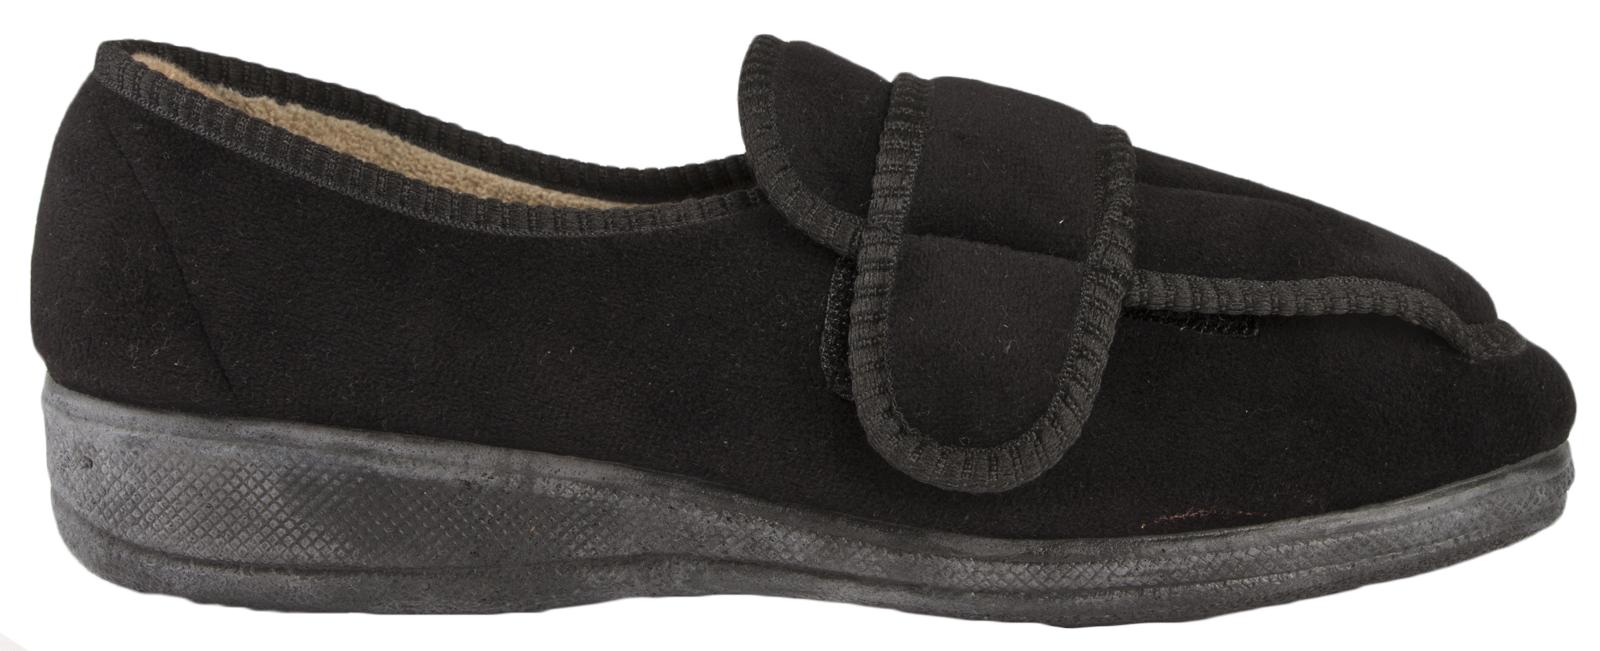 Da Donna Memory Foam Pantofole diabetici Lavabile Comfort Scarpe Wide Fit ORTOPEDICO